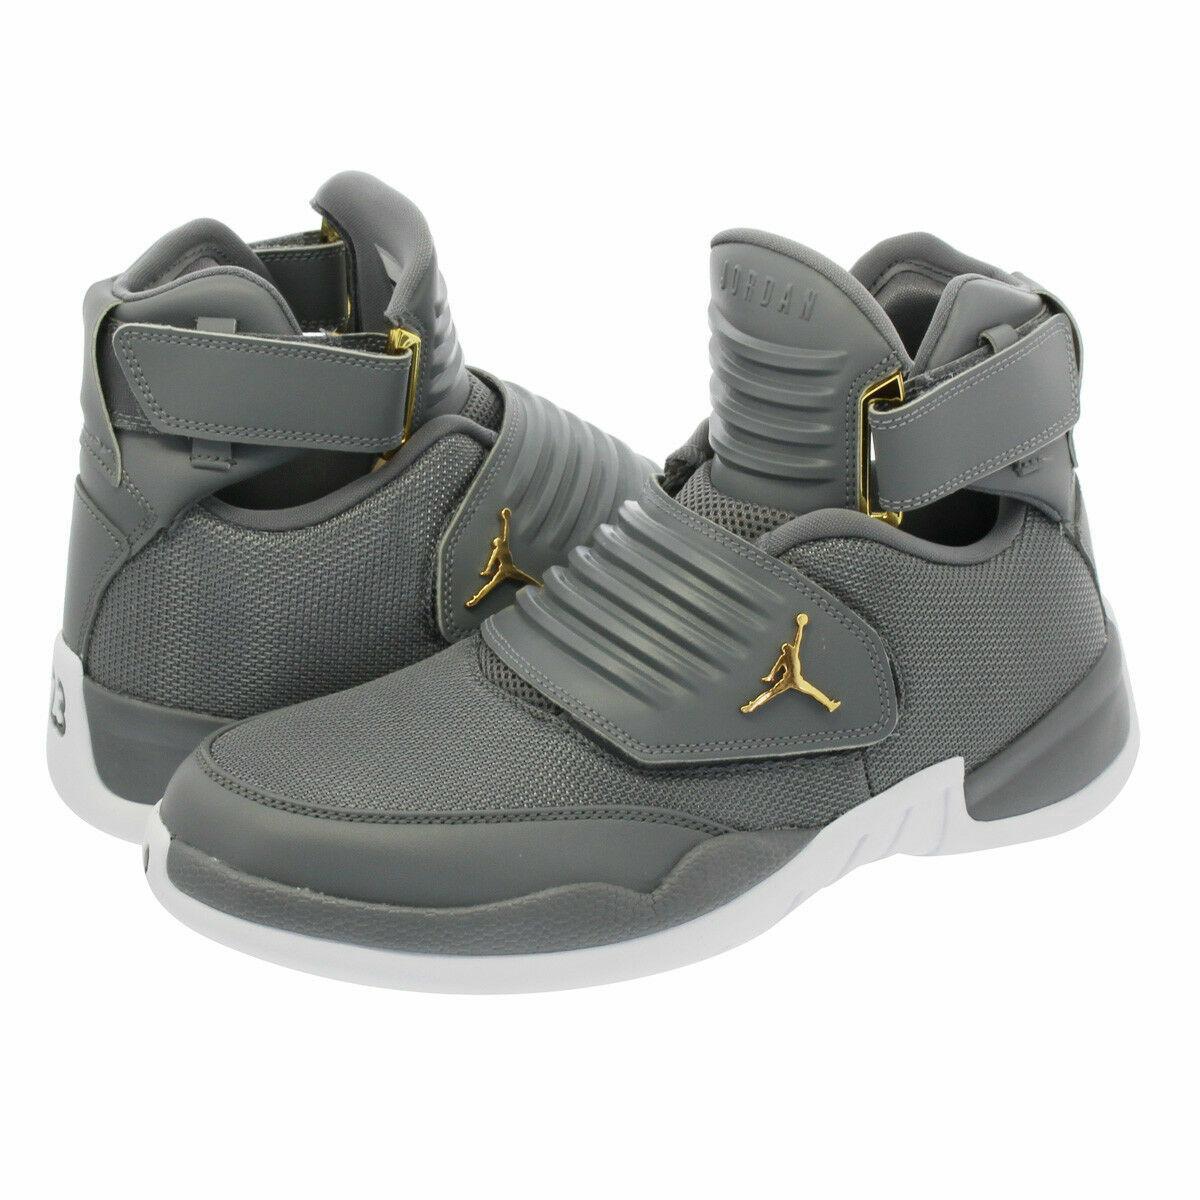 Nike Air Jordan Generation 23 Mens